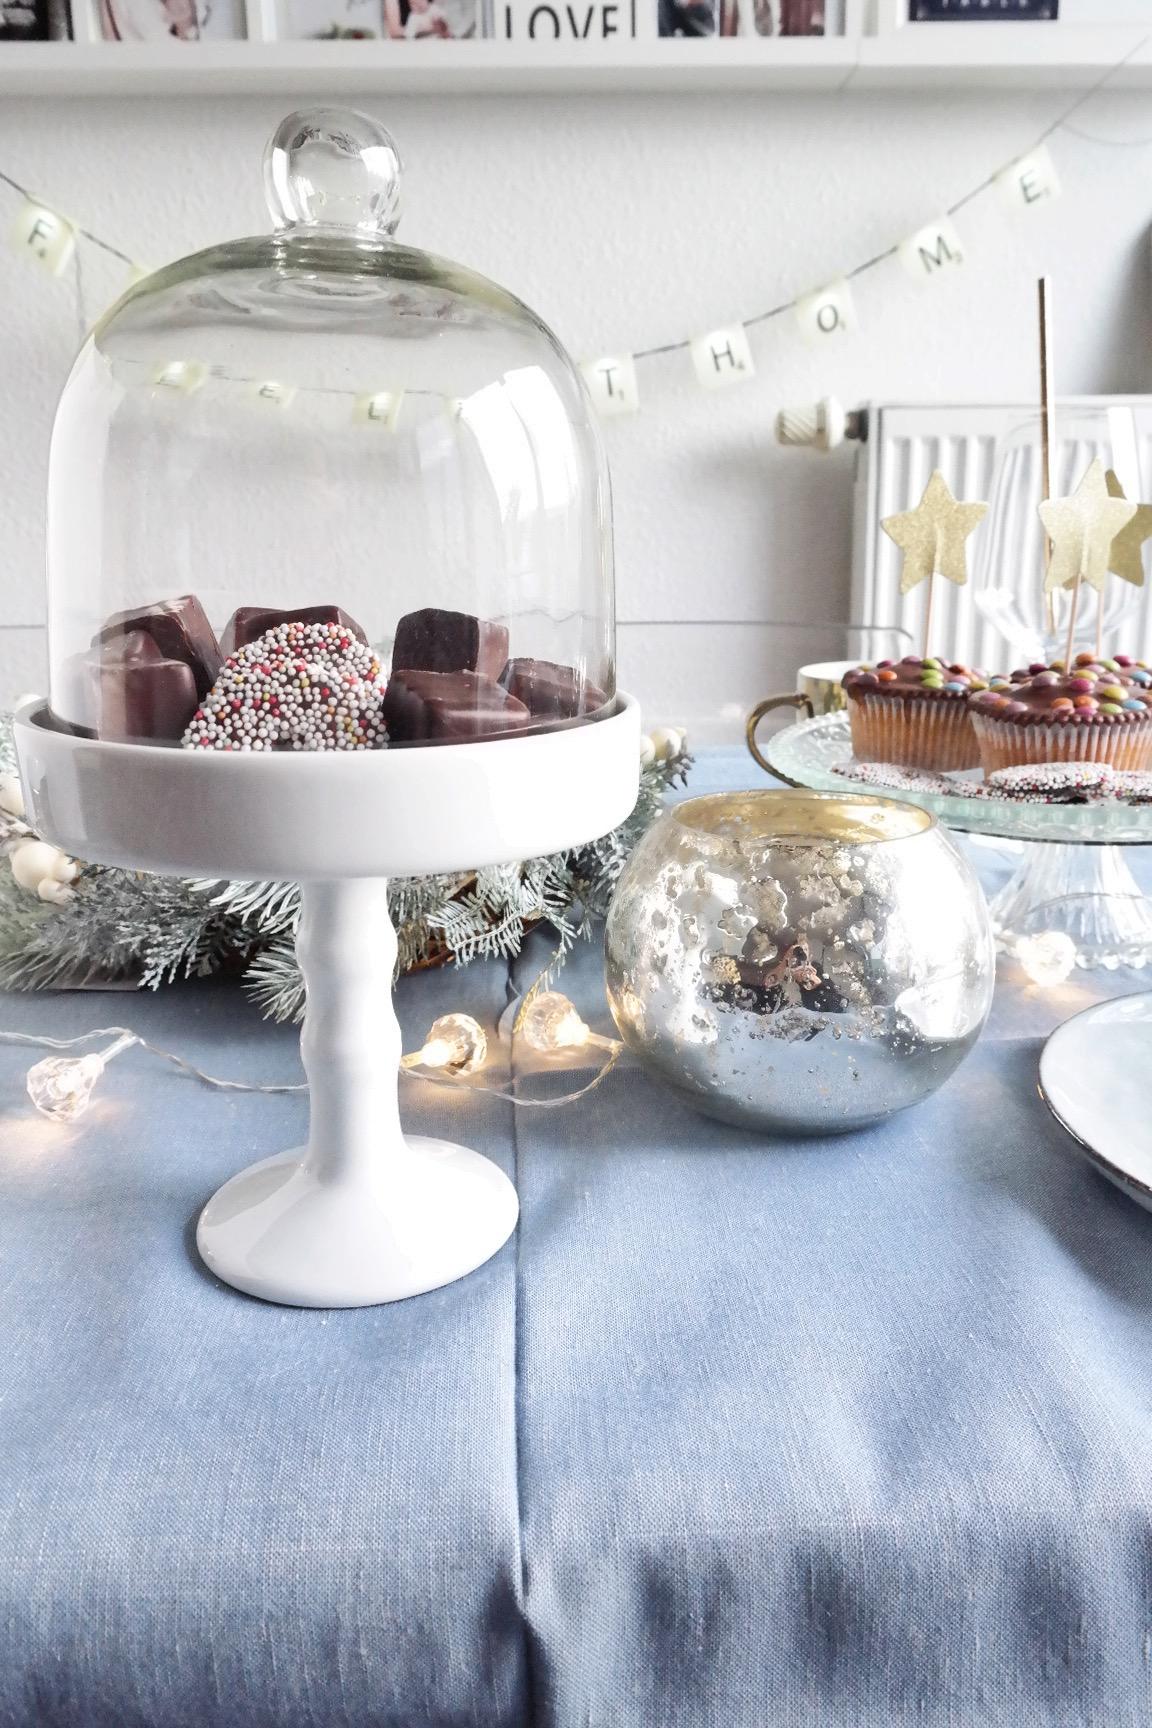 westwing-weihnachtstafel-interieurblog-bonn-koeln-missbonnebonne-lifestyleblog-7